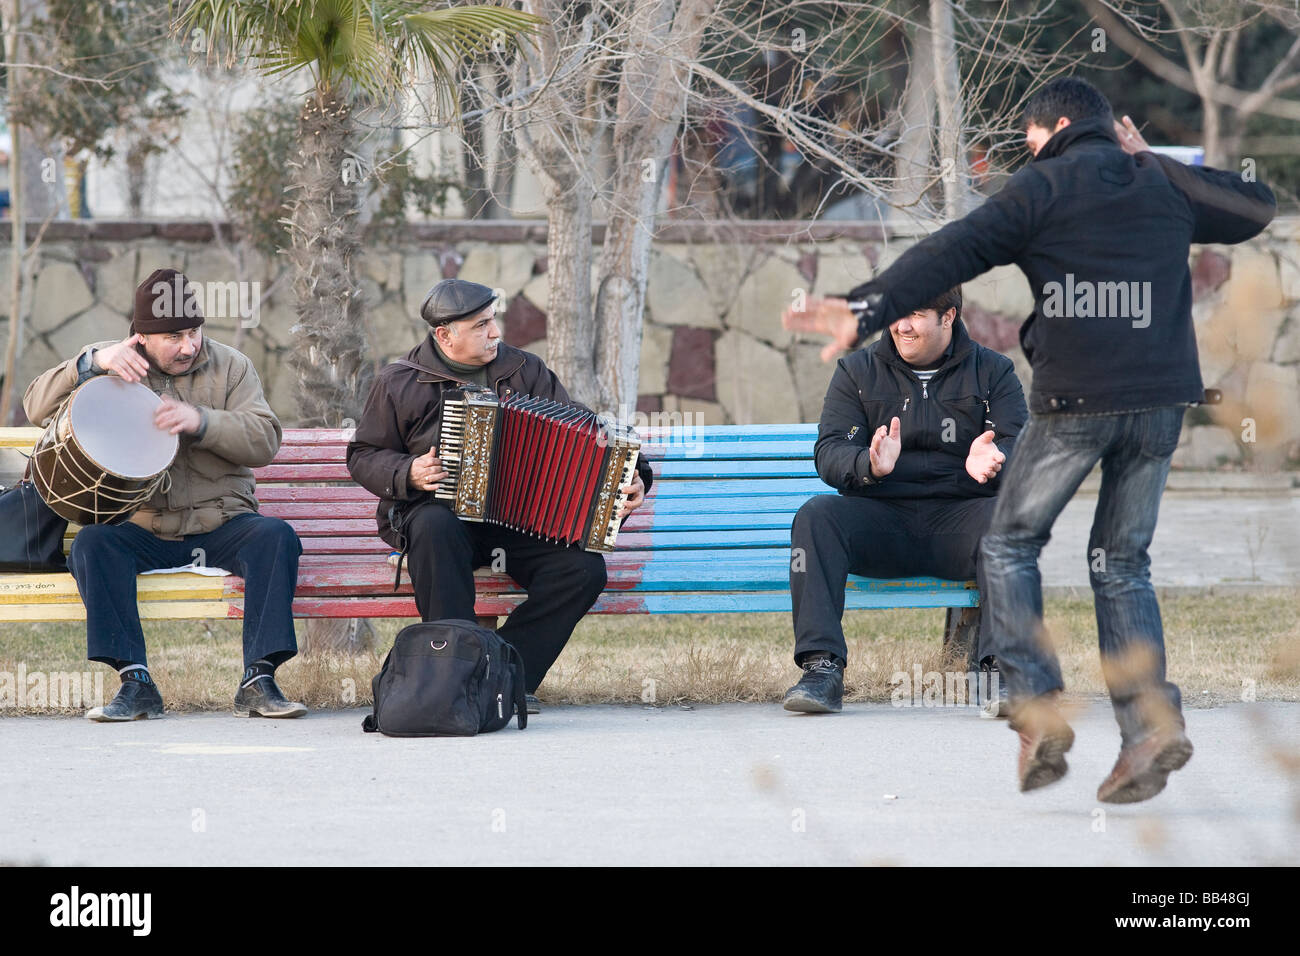 Street musicians and dancer in Baku, Azerbaijan - Stock Image